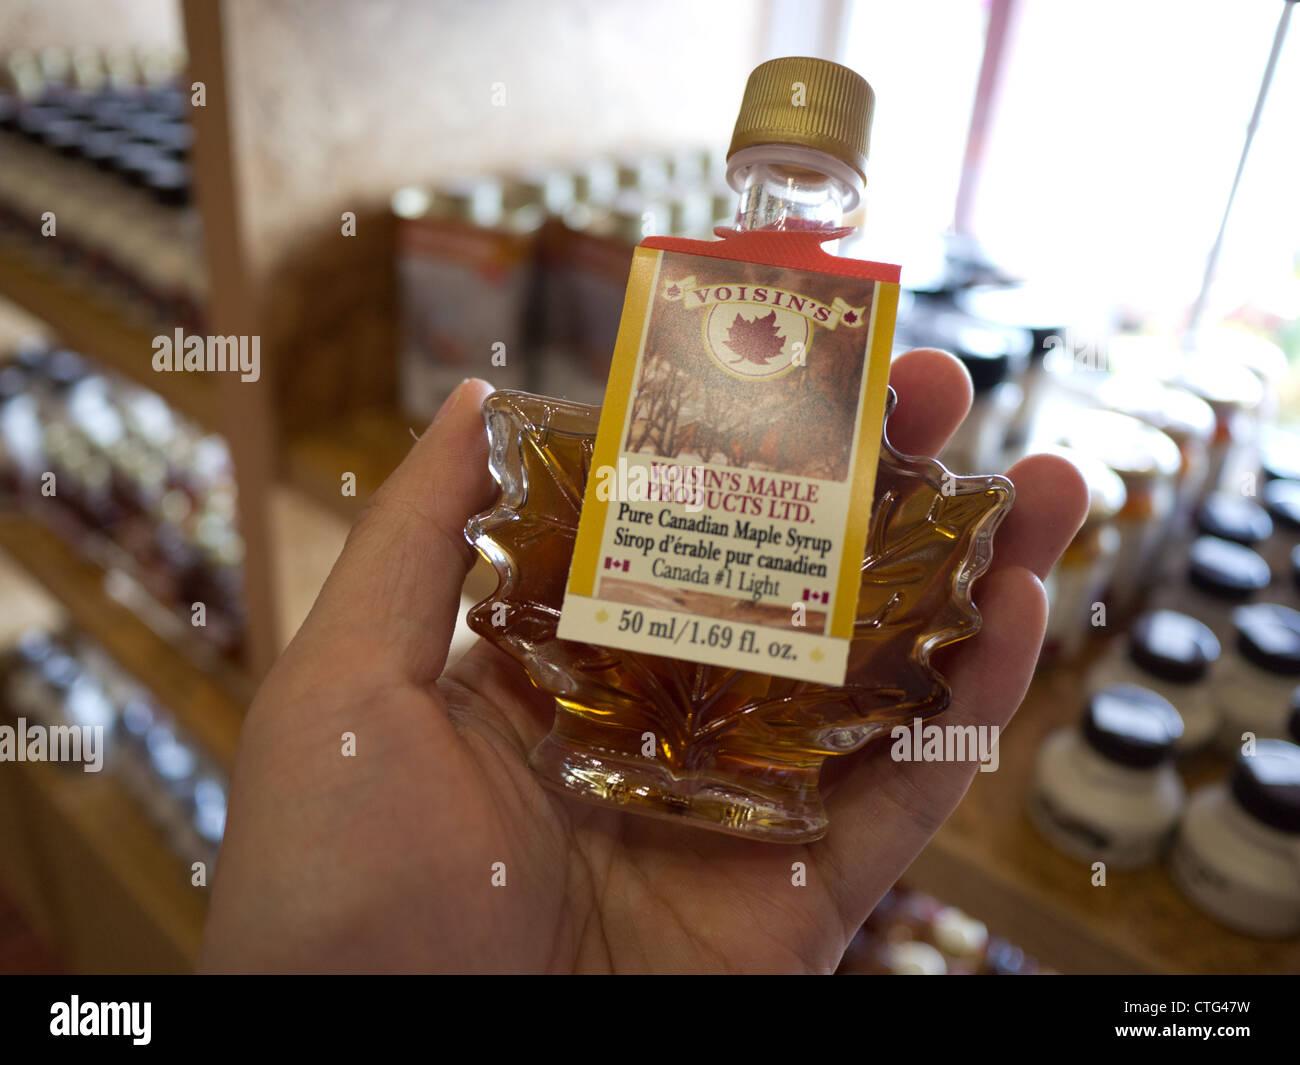 maple syrup bottle canada - Stock Image